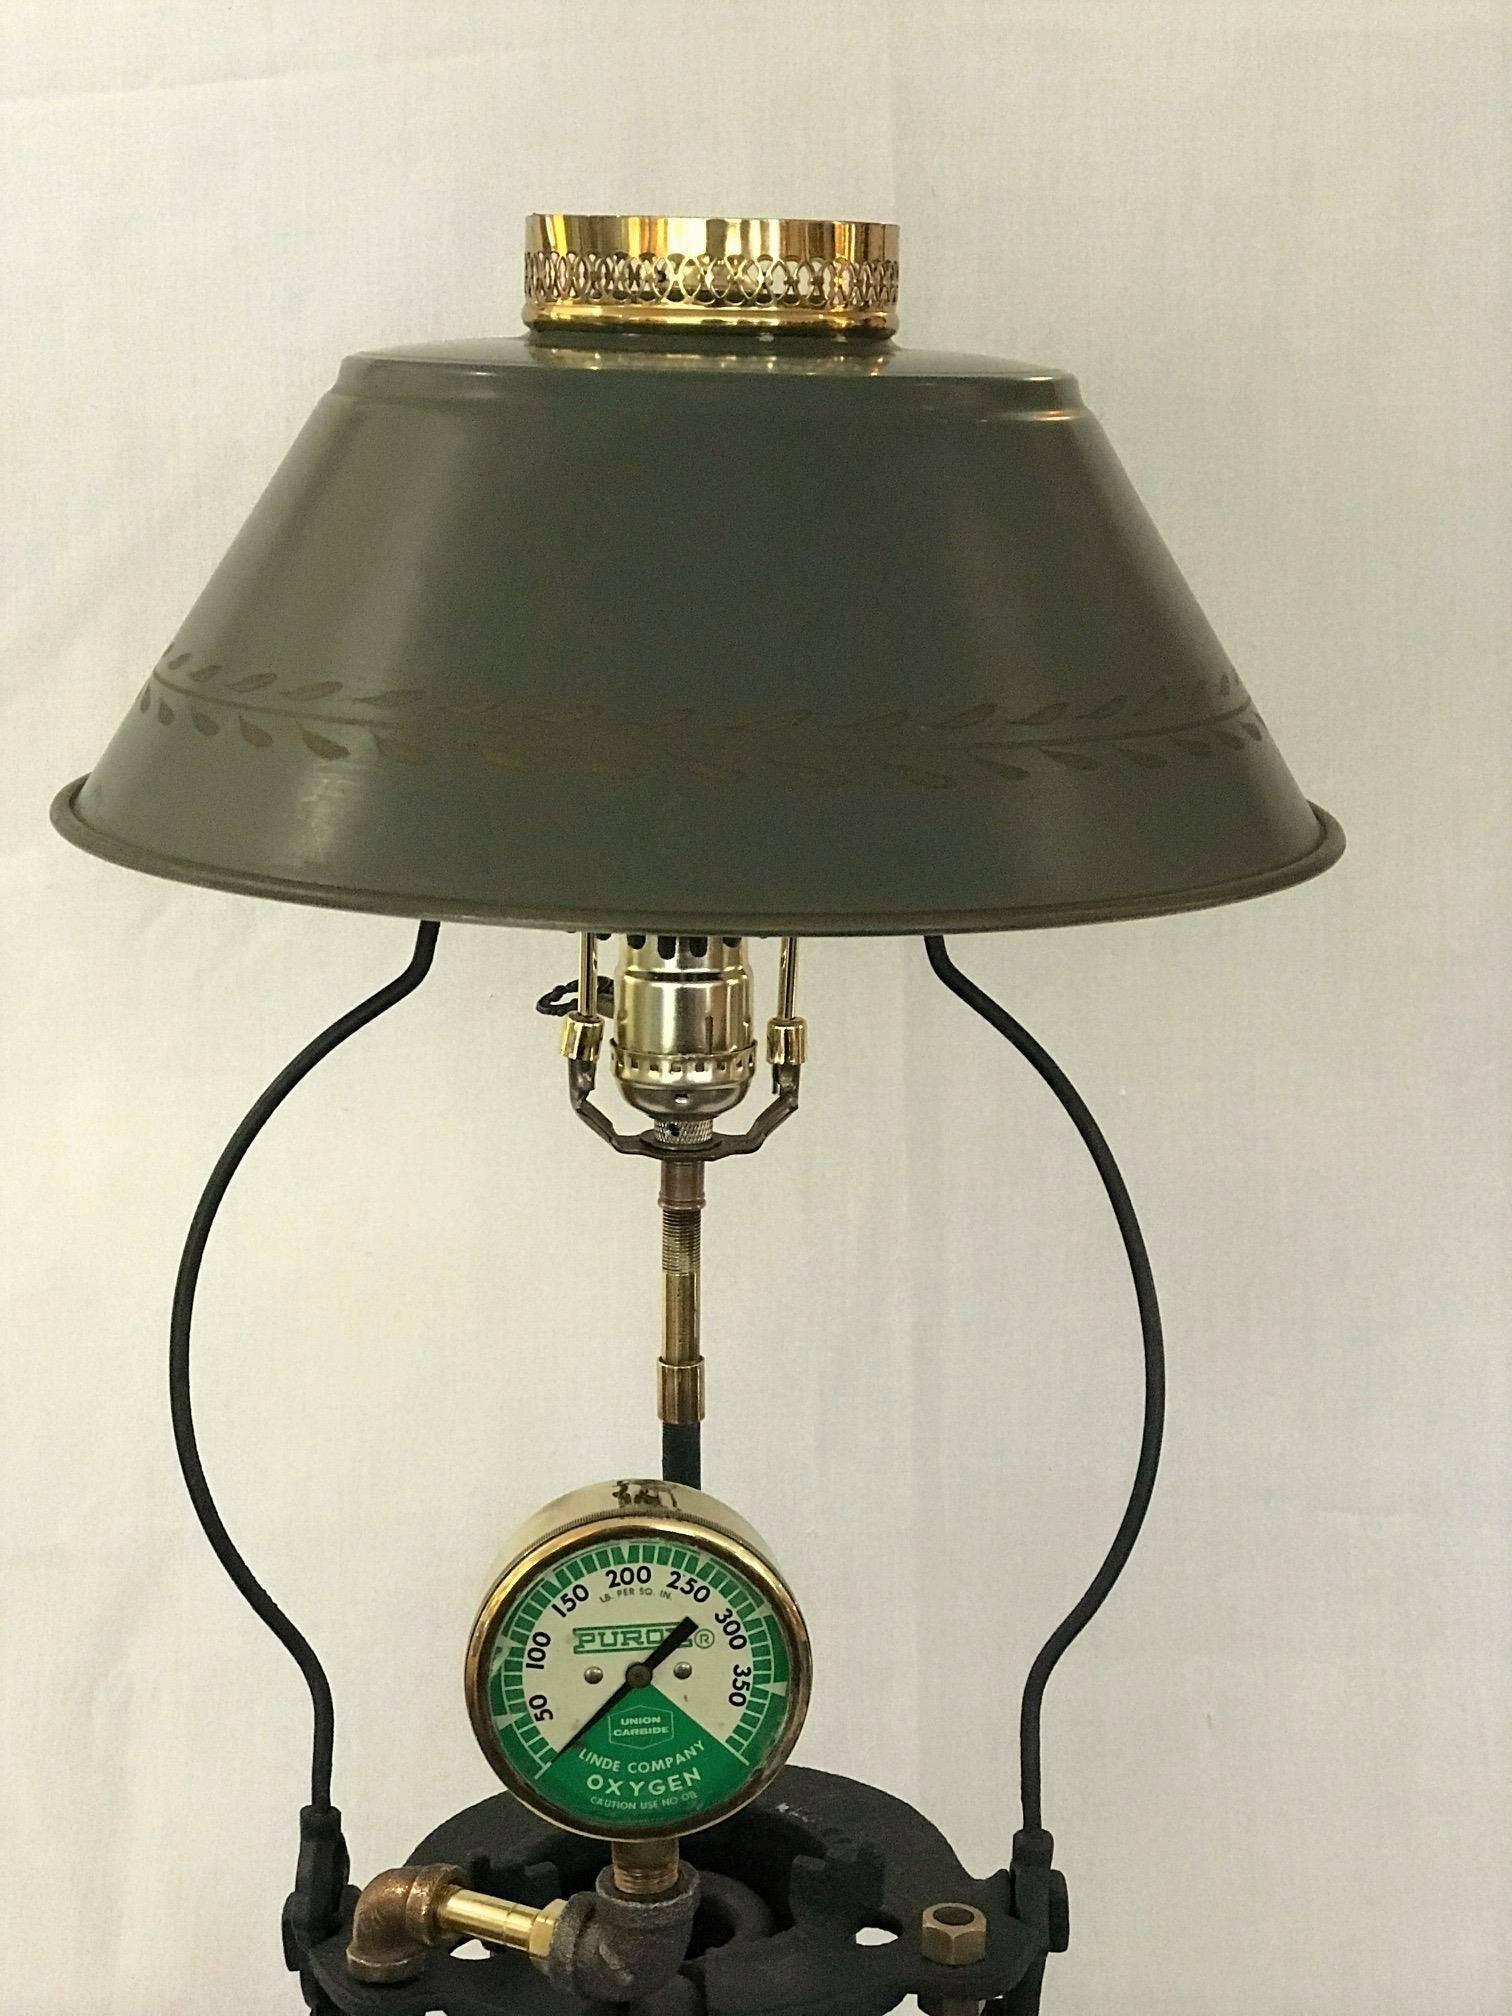 Sale man cave holiday gift sale lead melter lamp polished brass lead melter lamp polished brass oxygen gauge at 1stdibs aloadofball Choice Image